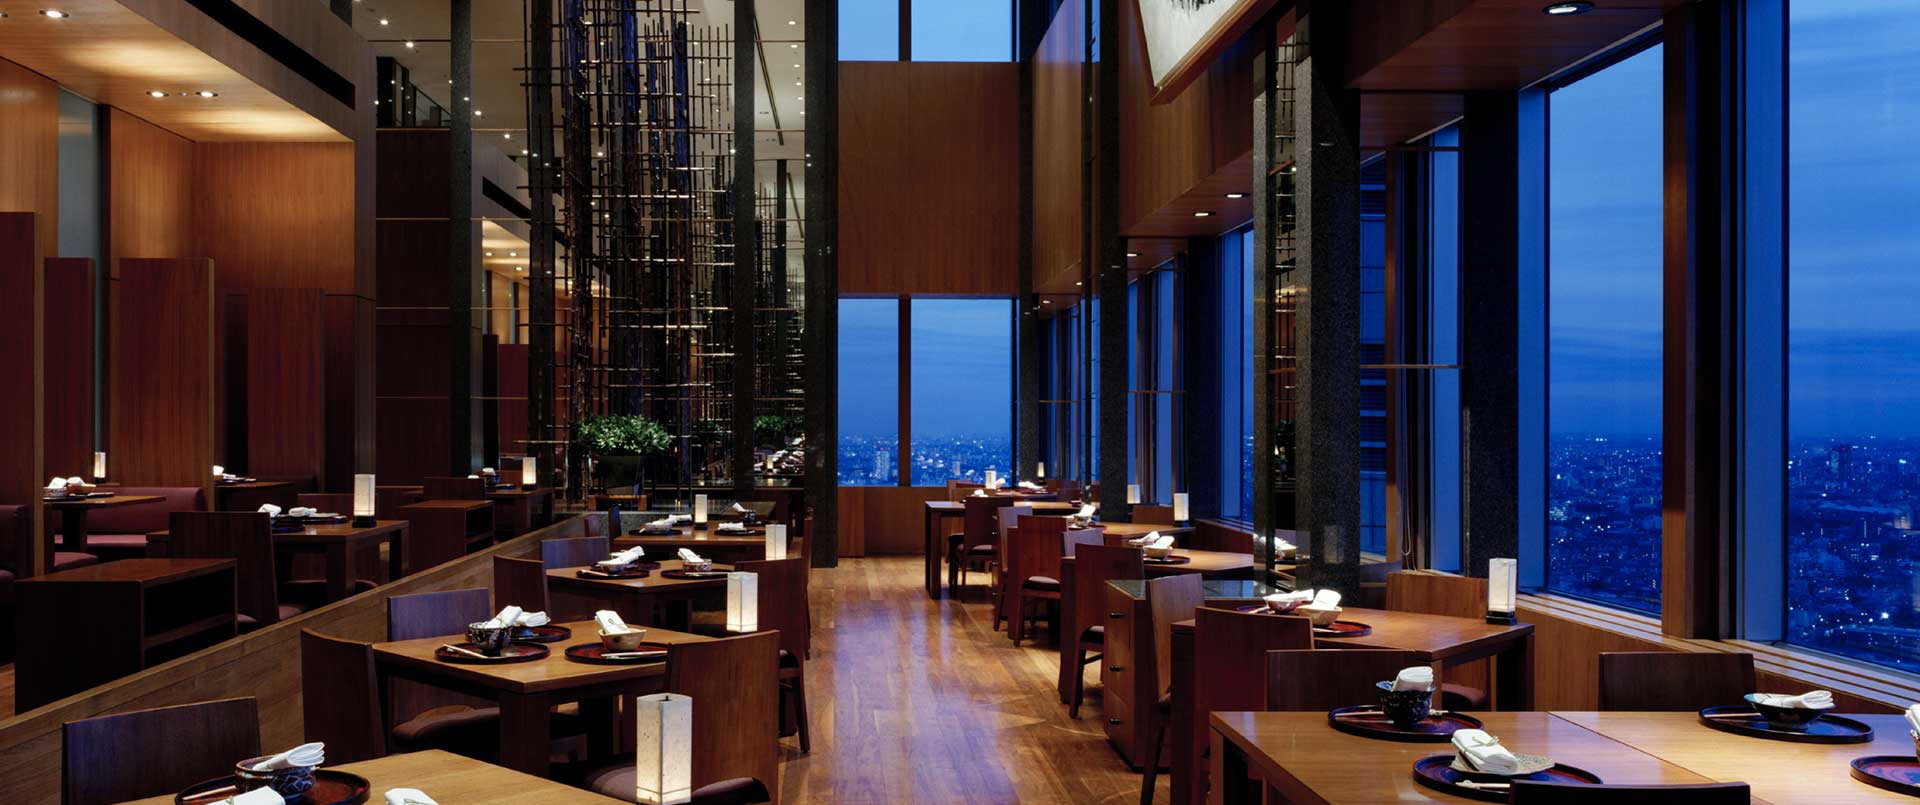 Hyatt Regency Hakone Resort & Spa | Ultimate Travel Co